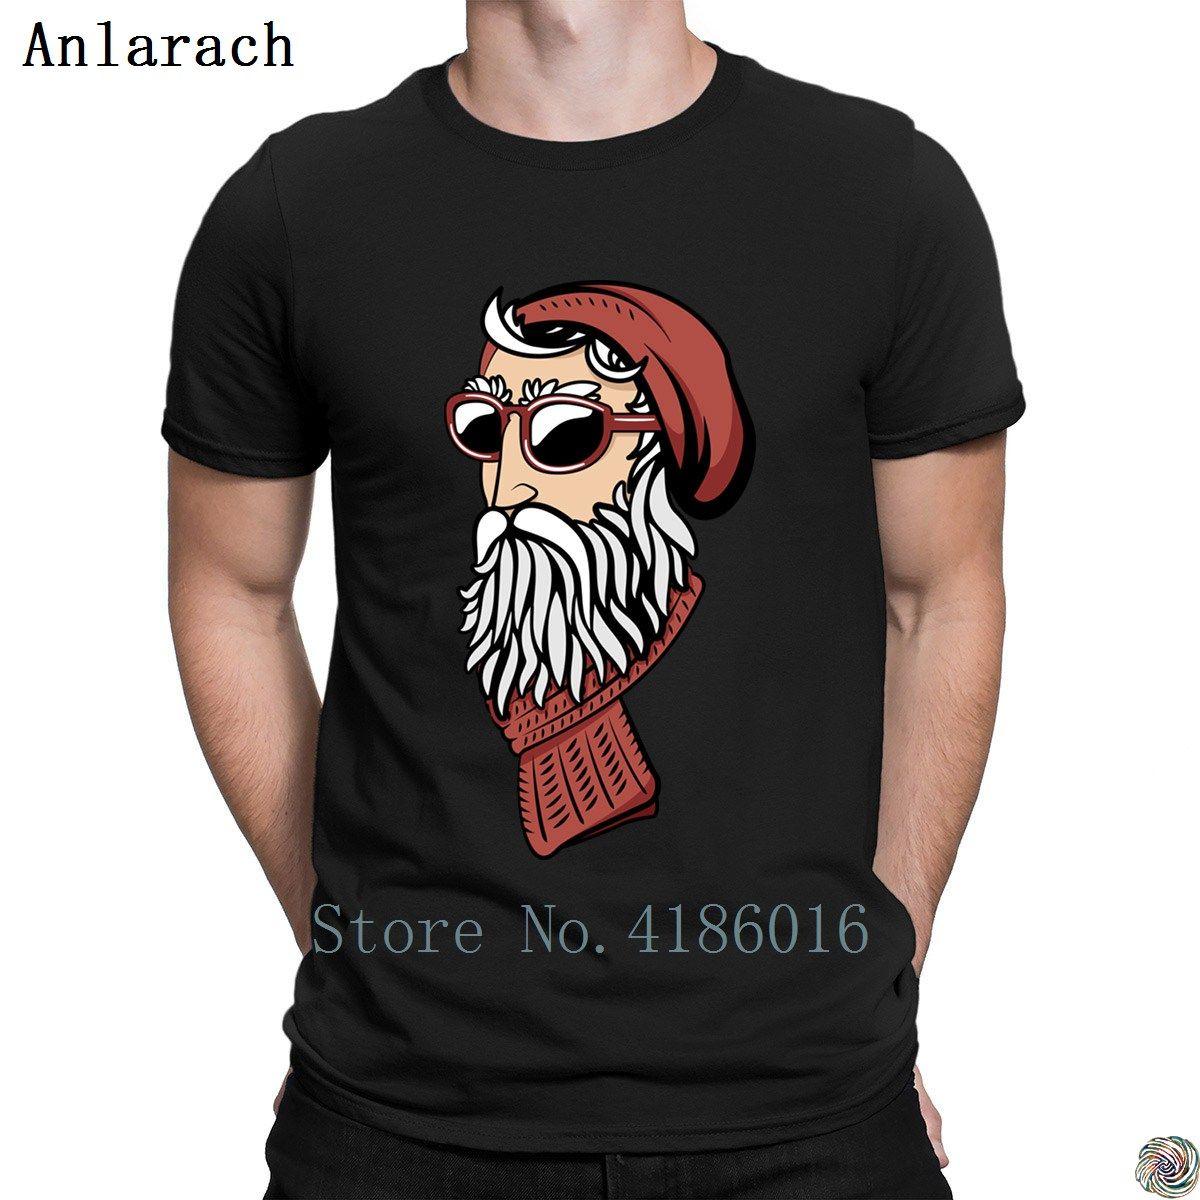 7b38e7bc Graphic Design For Tee Shirts - DREAMWORKS